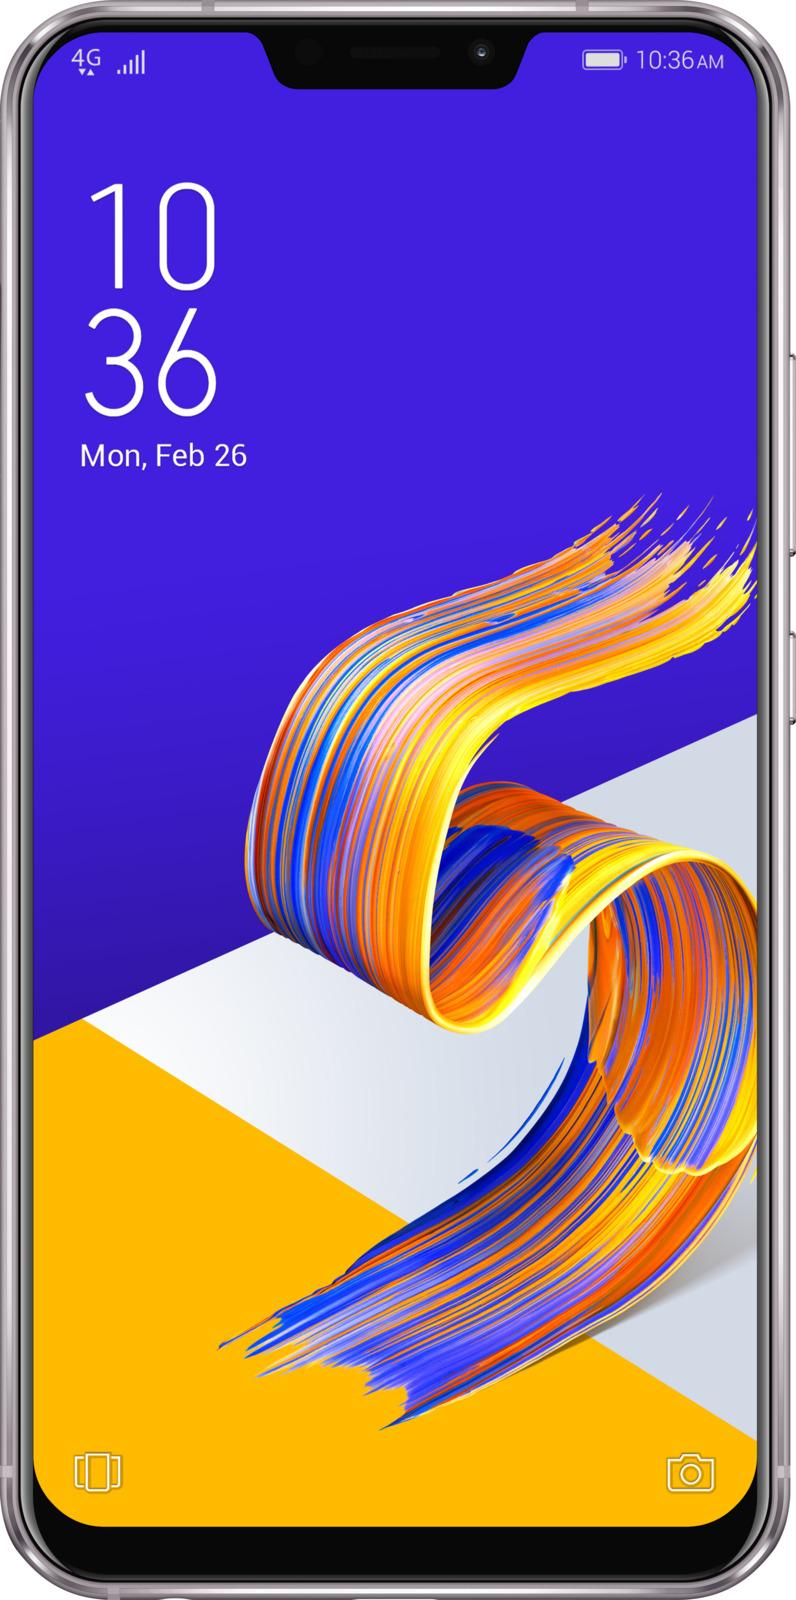 Смартфон ASUS ZenFone 5 ZE620KL 4/64GB gray смартфон asus zenfone 5 ze620kl 4 64gb midnight blue